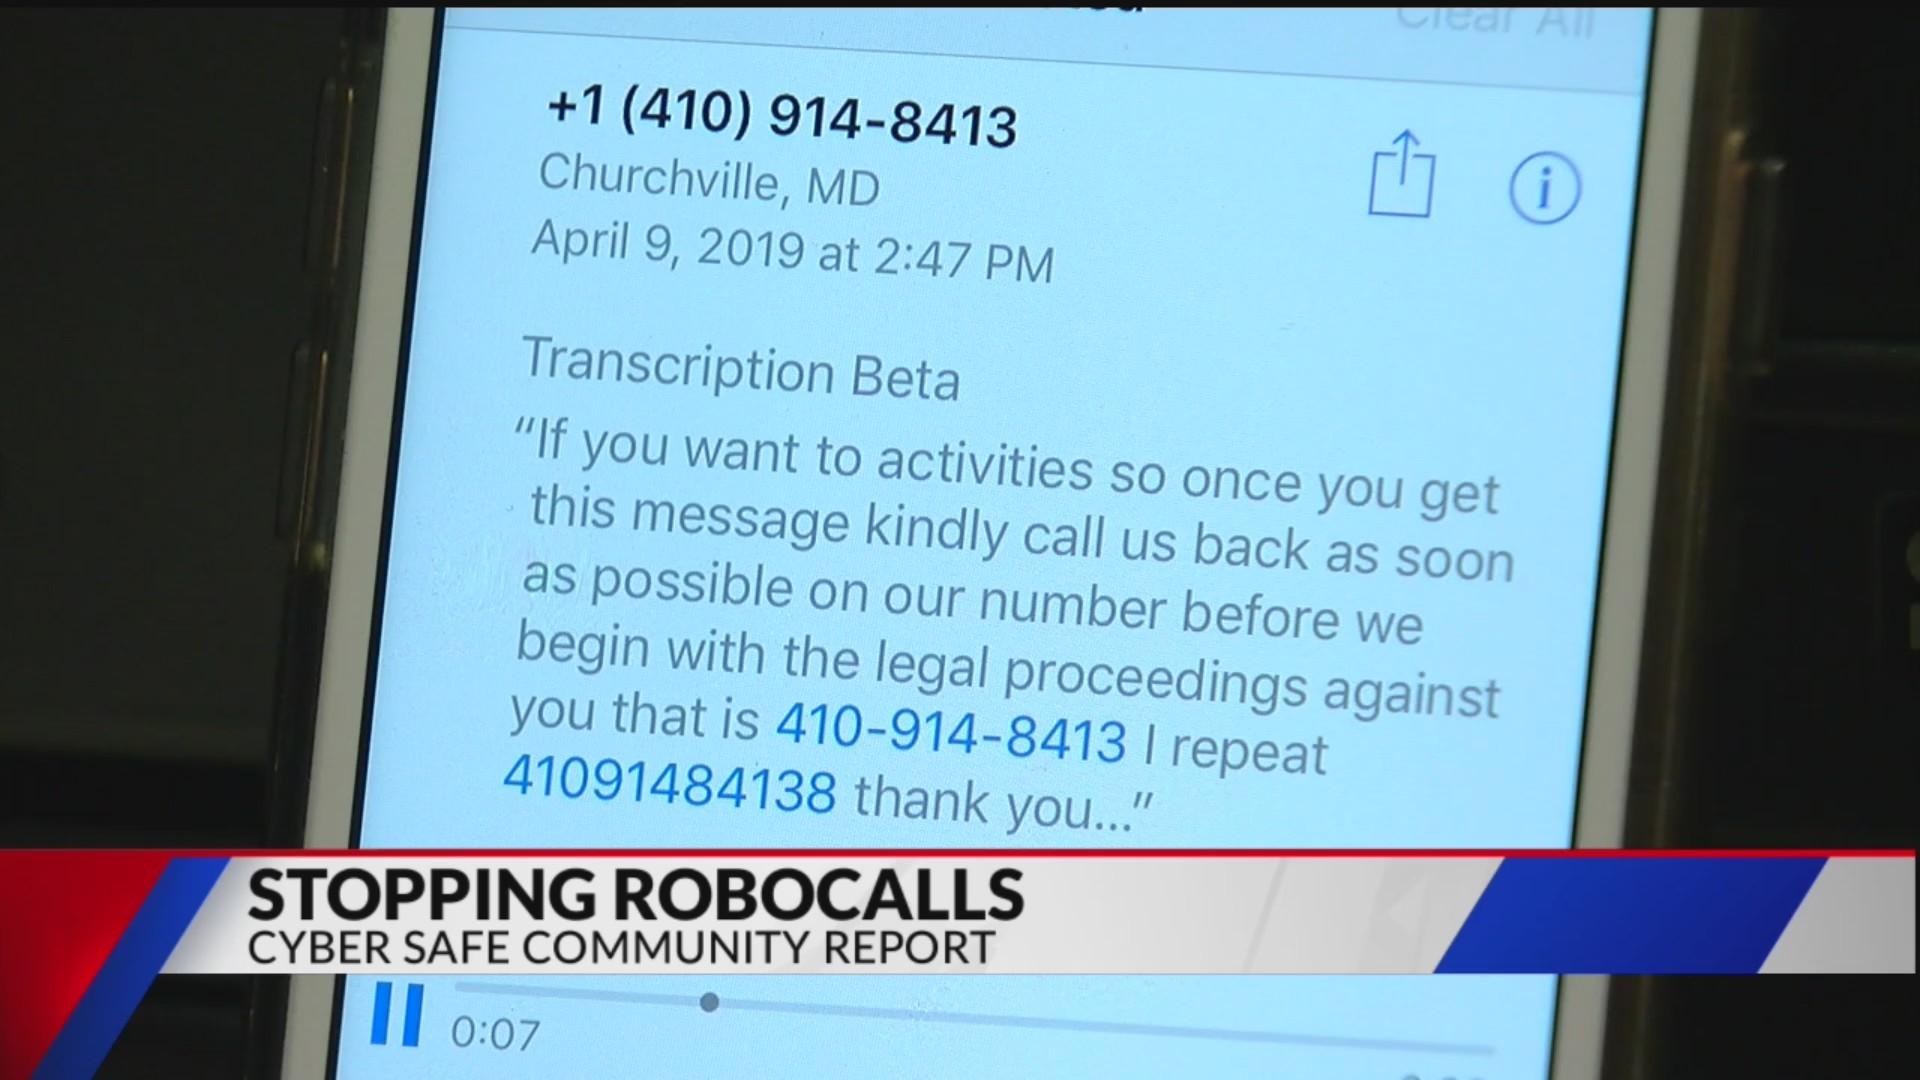 Cyber Safe Community Report: Robocalls